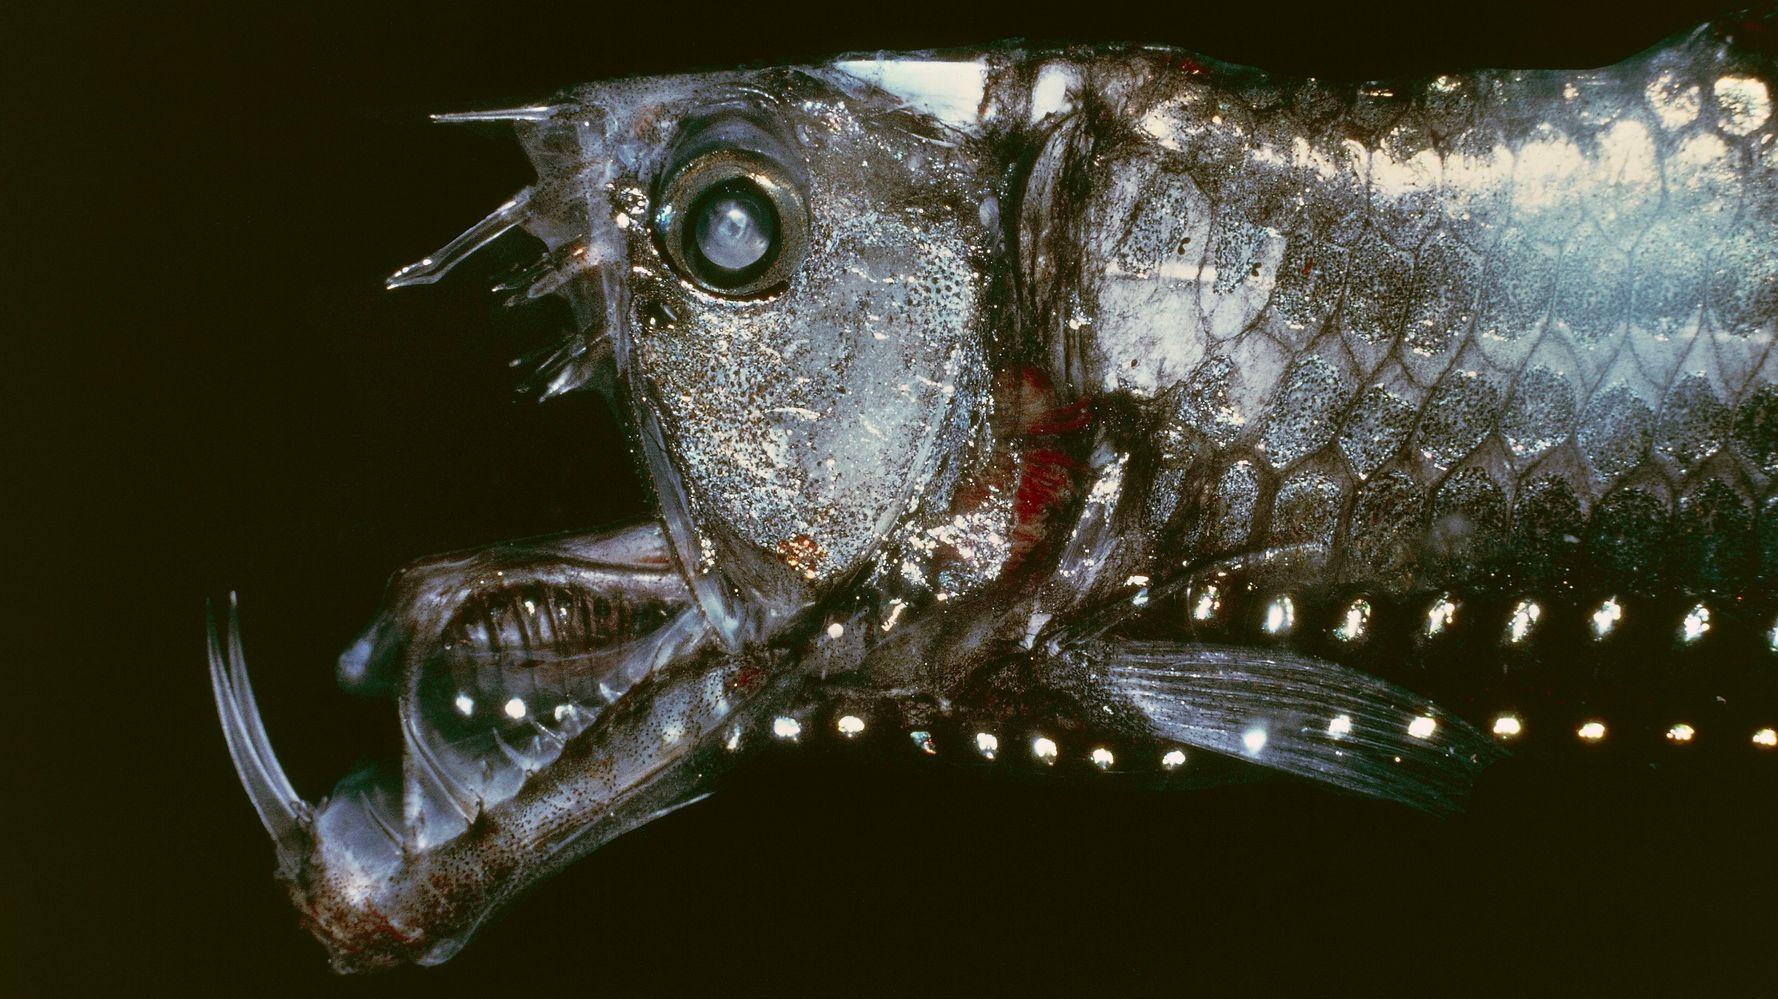 обитатели глубин океана фото имитируя камень